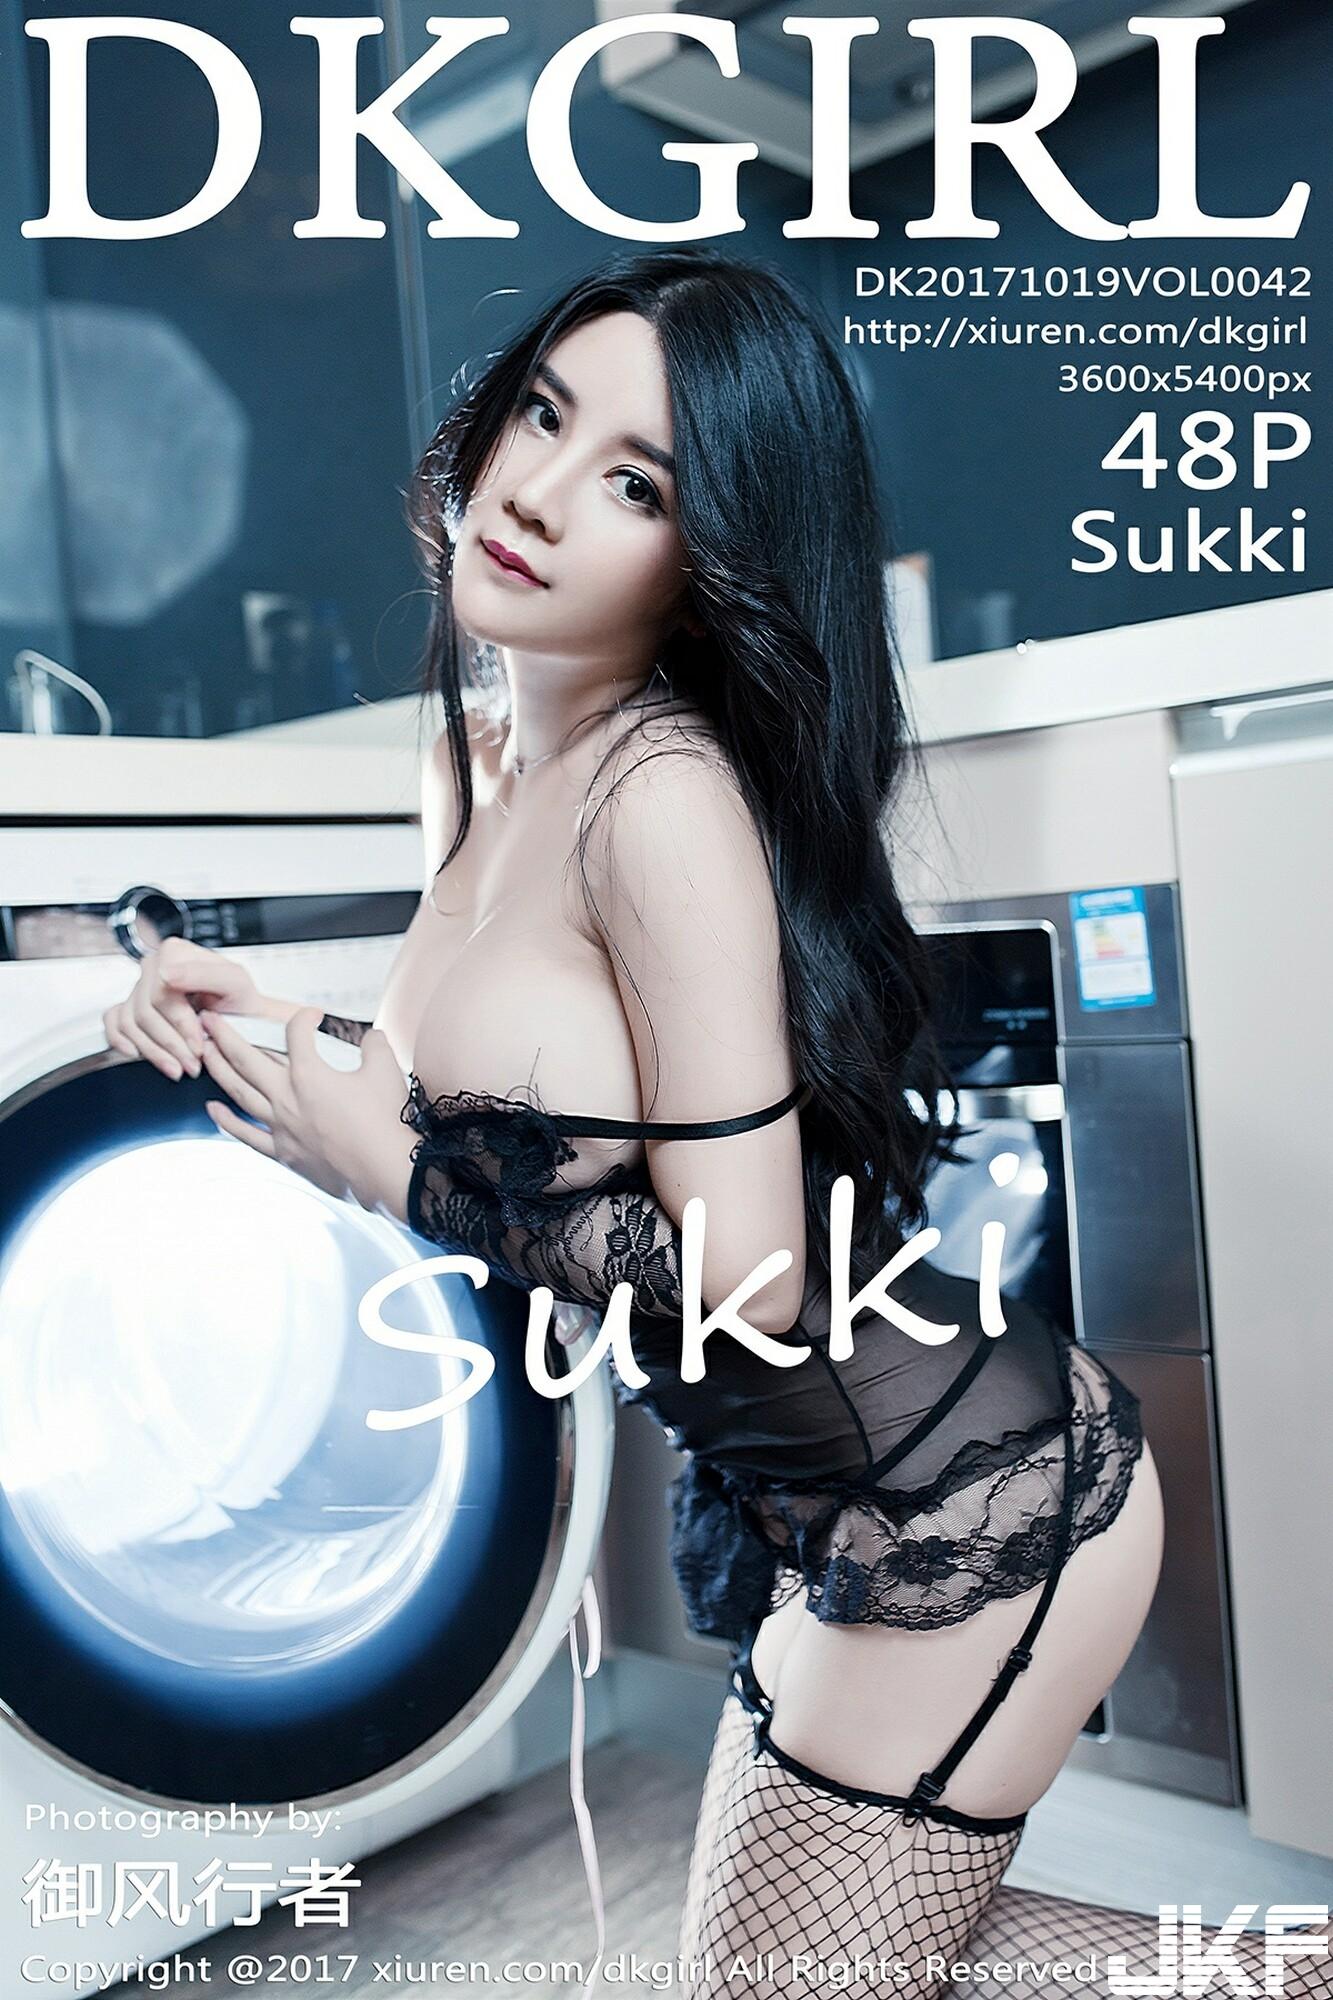 【DKGirl御女郎系列】2017.10.19 VOL.042 Sukki性感寫真【49P】 - 貼圖 - 絲襪美腿 -